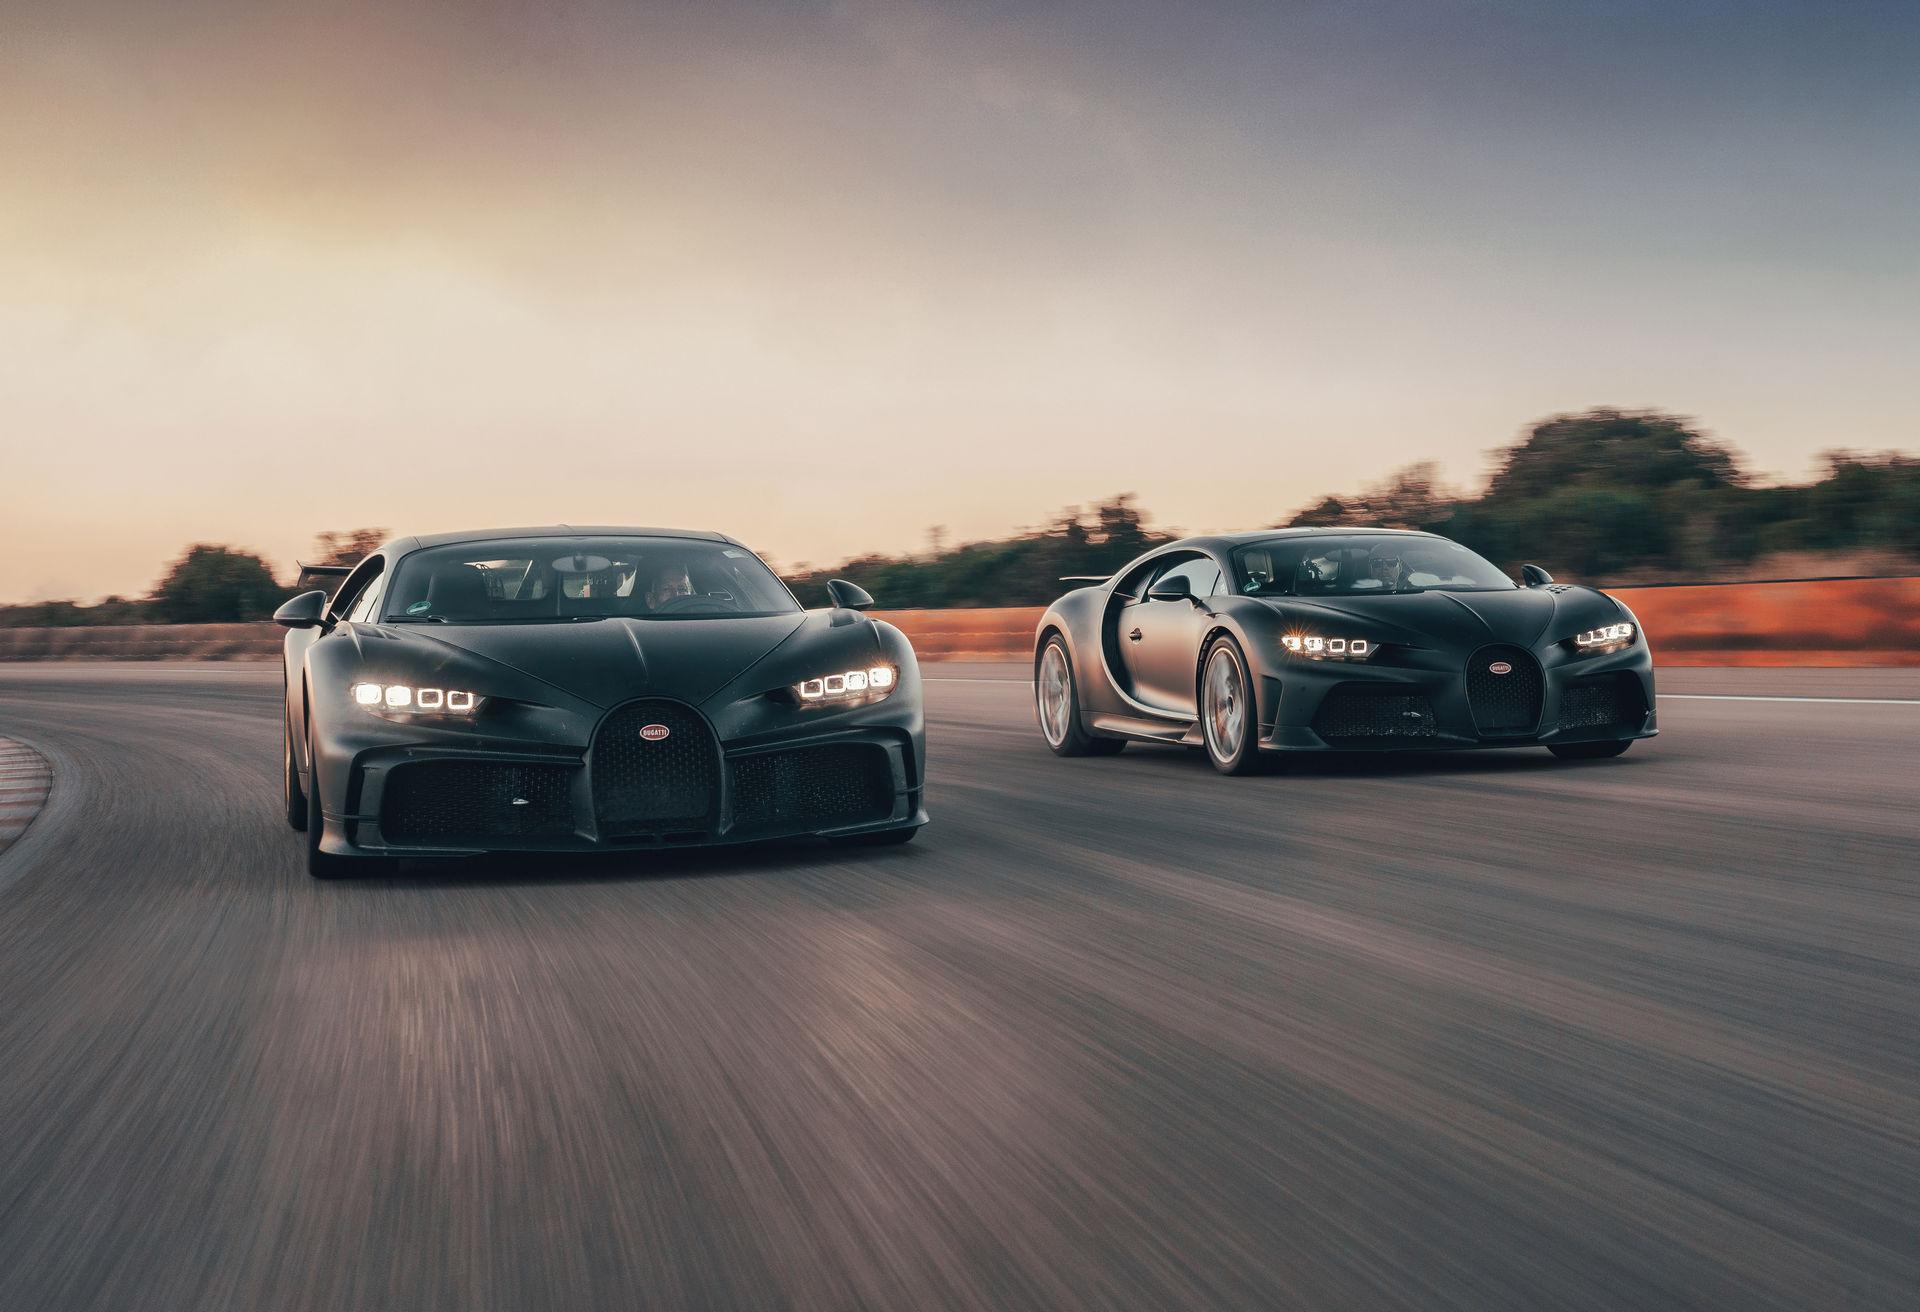 VW Grubu Porsche-Rimac-Bugatti üçgenini kurmakta kararlı